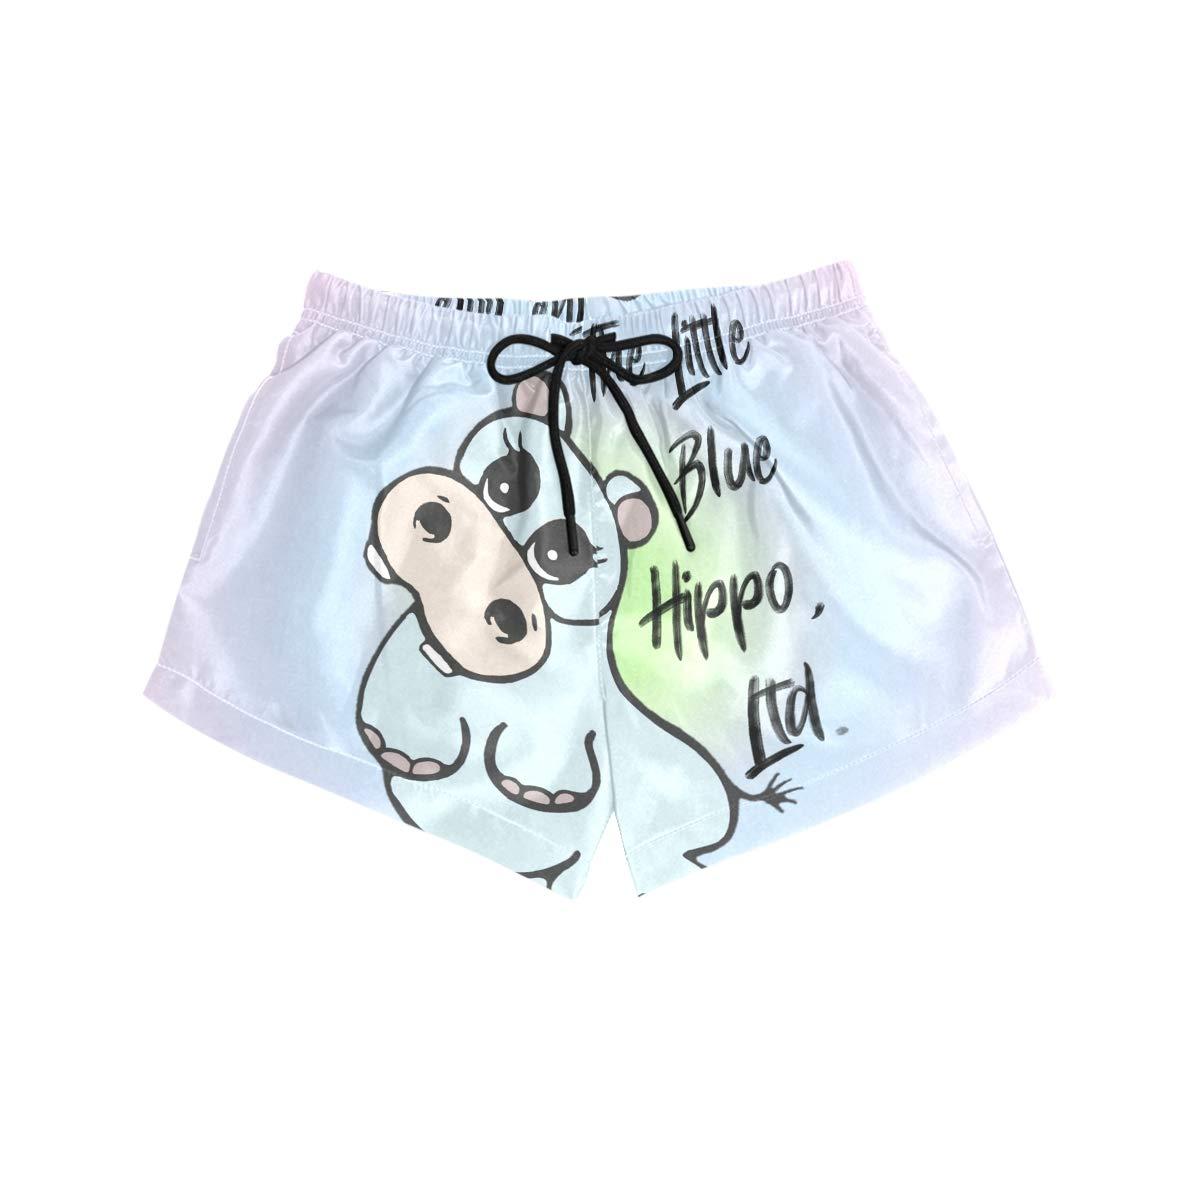 NWTSPY Little Hippo Womens Sport Beach Swim Shorts Board Shorts Swimsuit with Mesh Lining